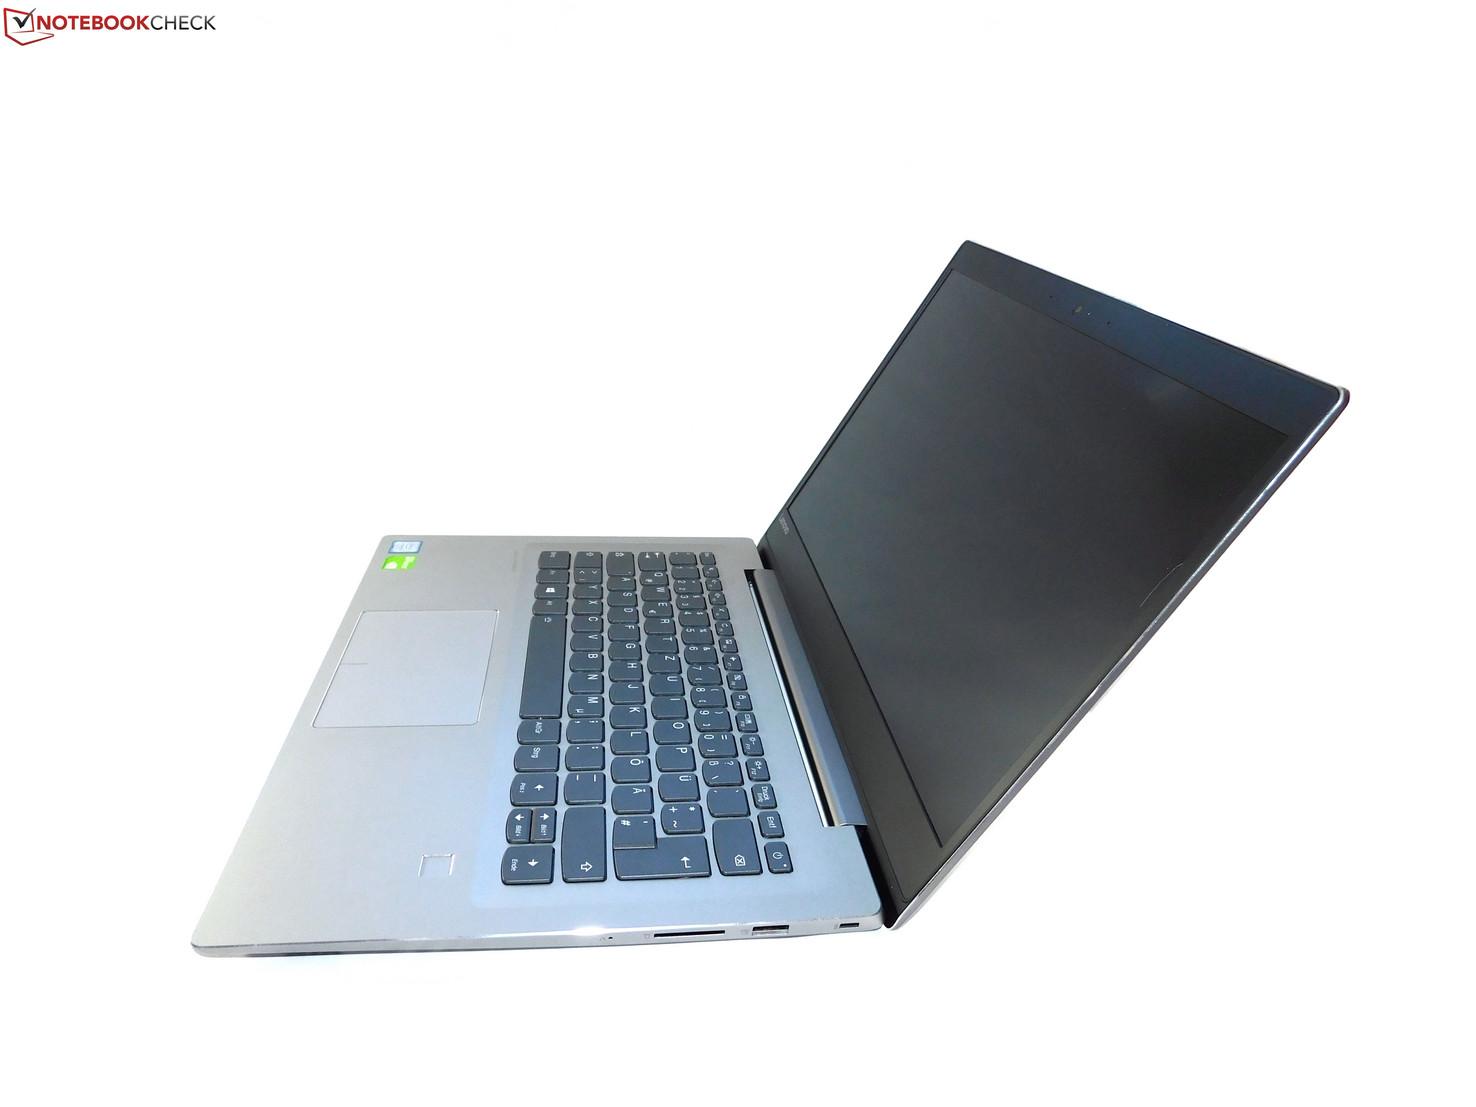 csm side2 d8fe42eca5 - لپ تاپ لنوو Lenovo IdeaPad 520